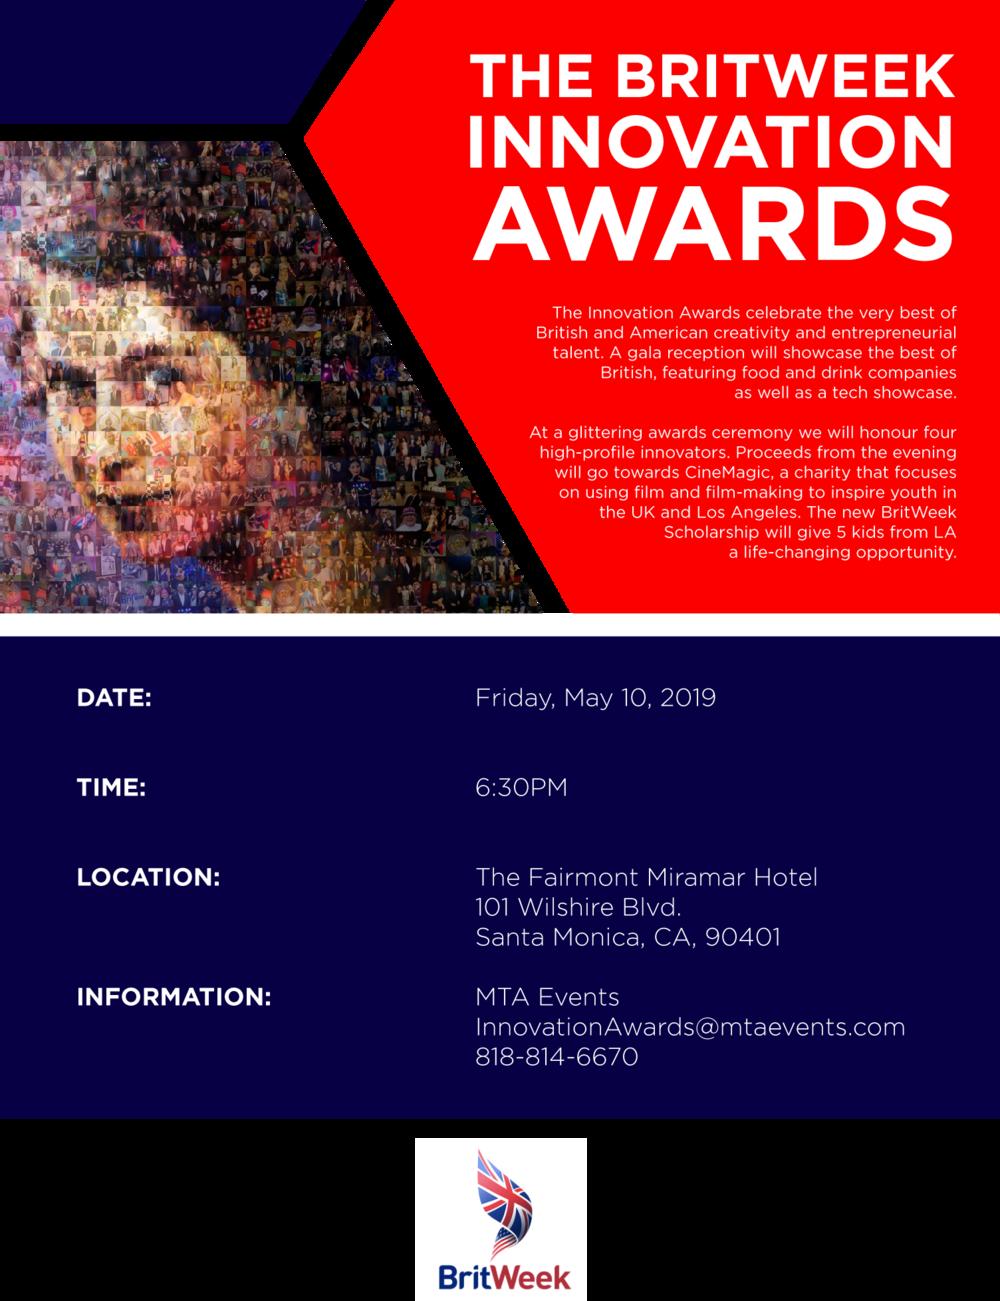 Britweek Innovation_Awards_Invite.png